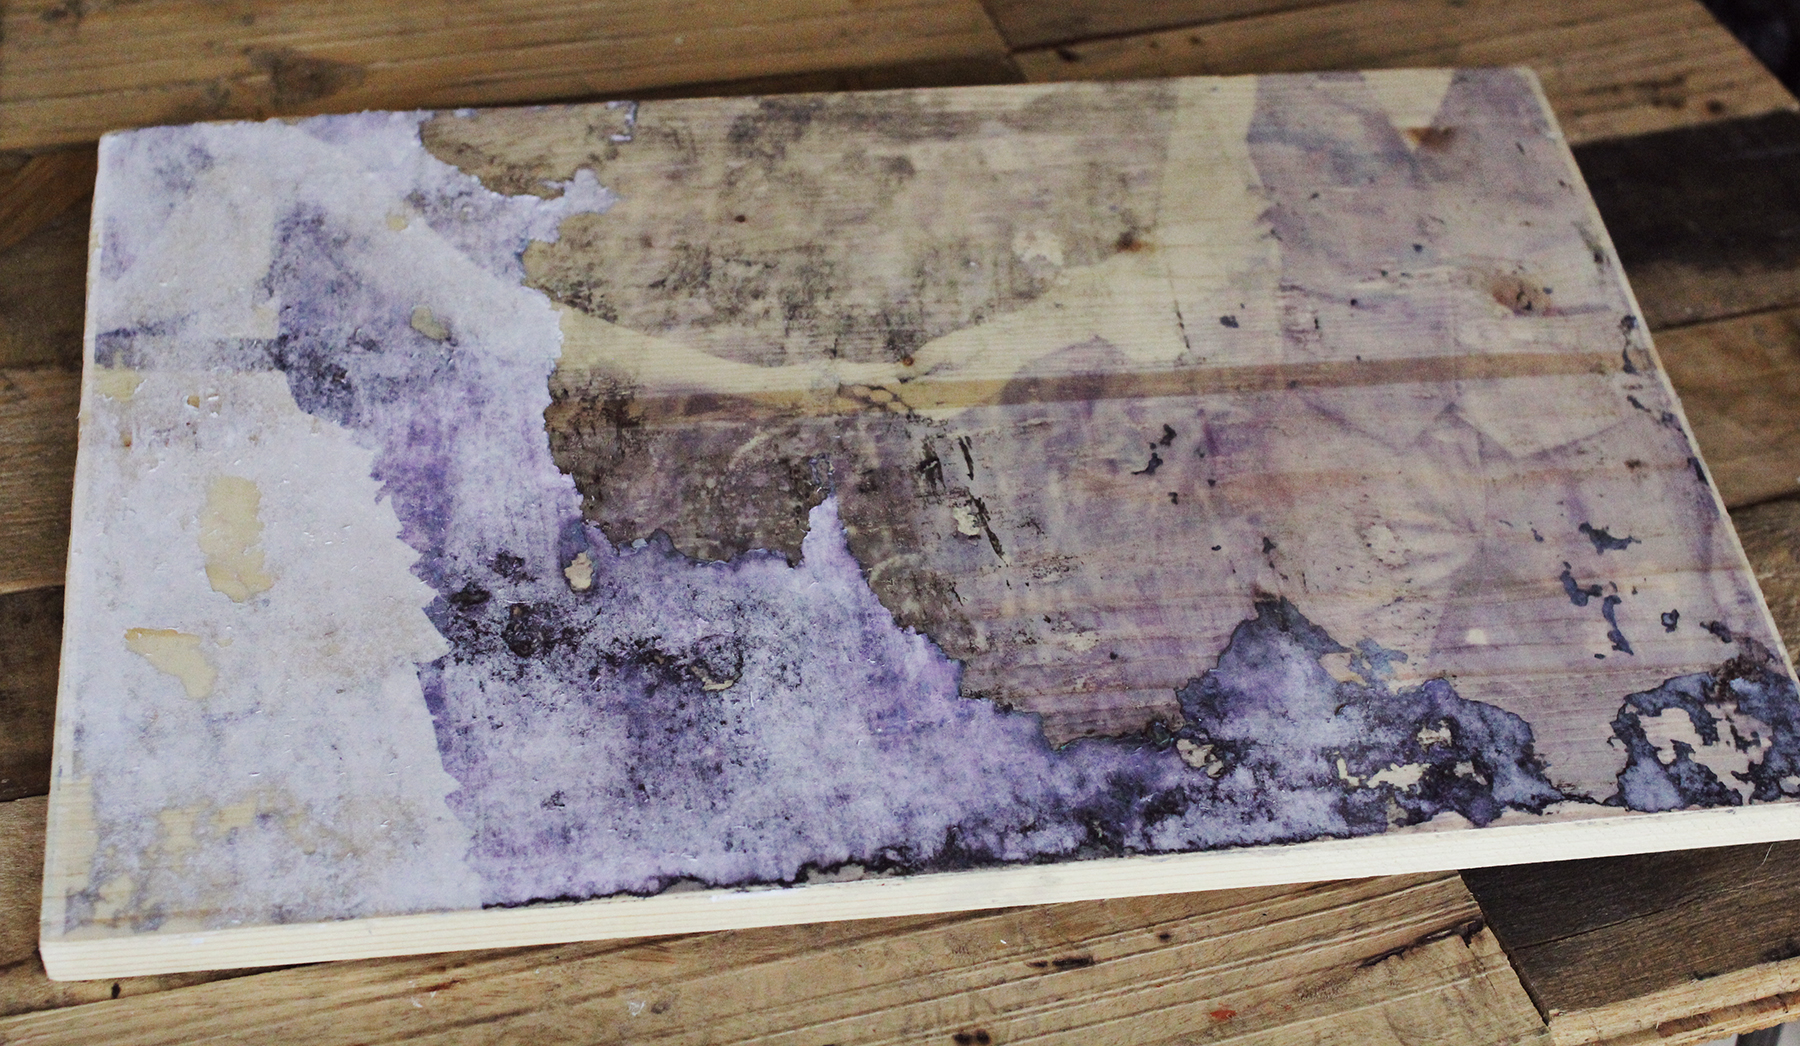 Trouble shooting wood transfers using ink jet printers